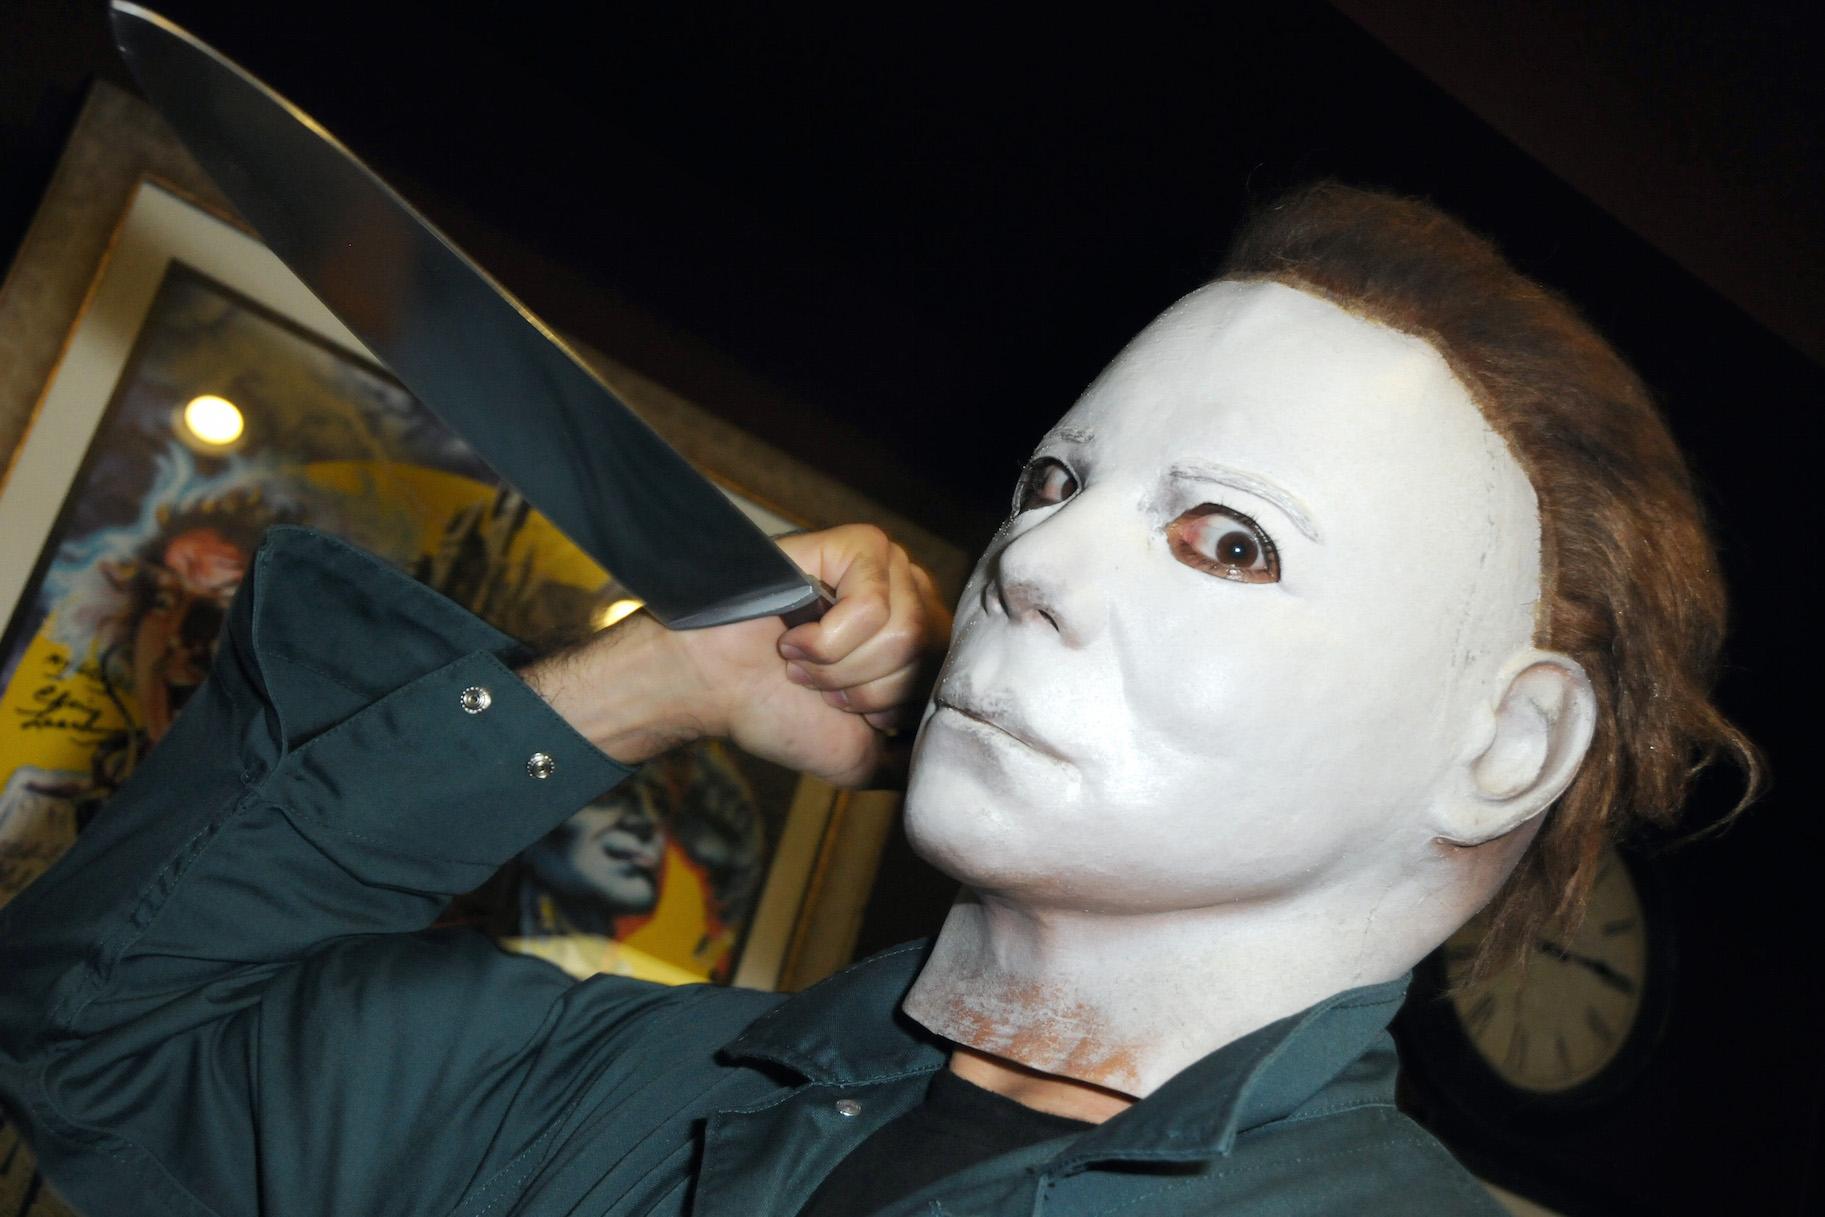 Fakta - og fiktion - bag 'Halloween'-filmene